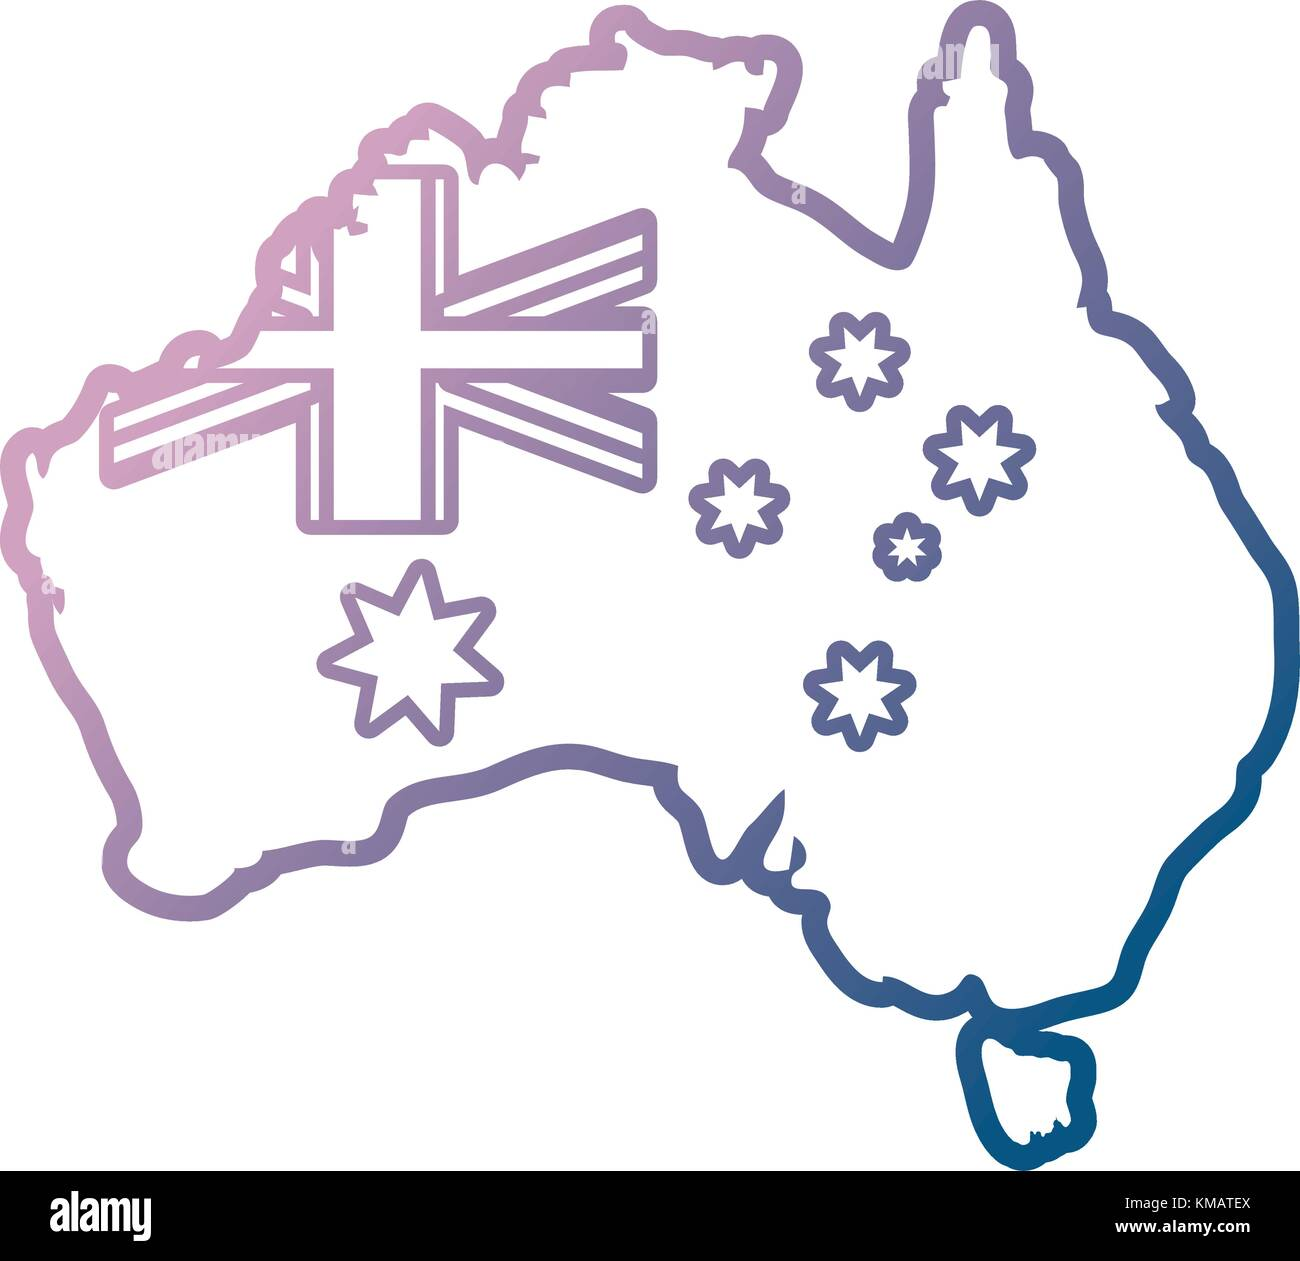 Australia Map Icon.Australia Country Map Icon Stock Vector Art Illustration Vector